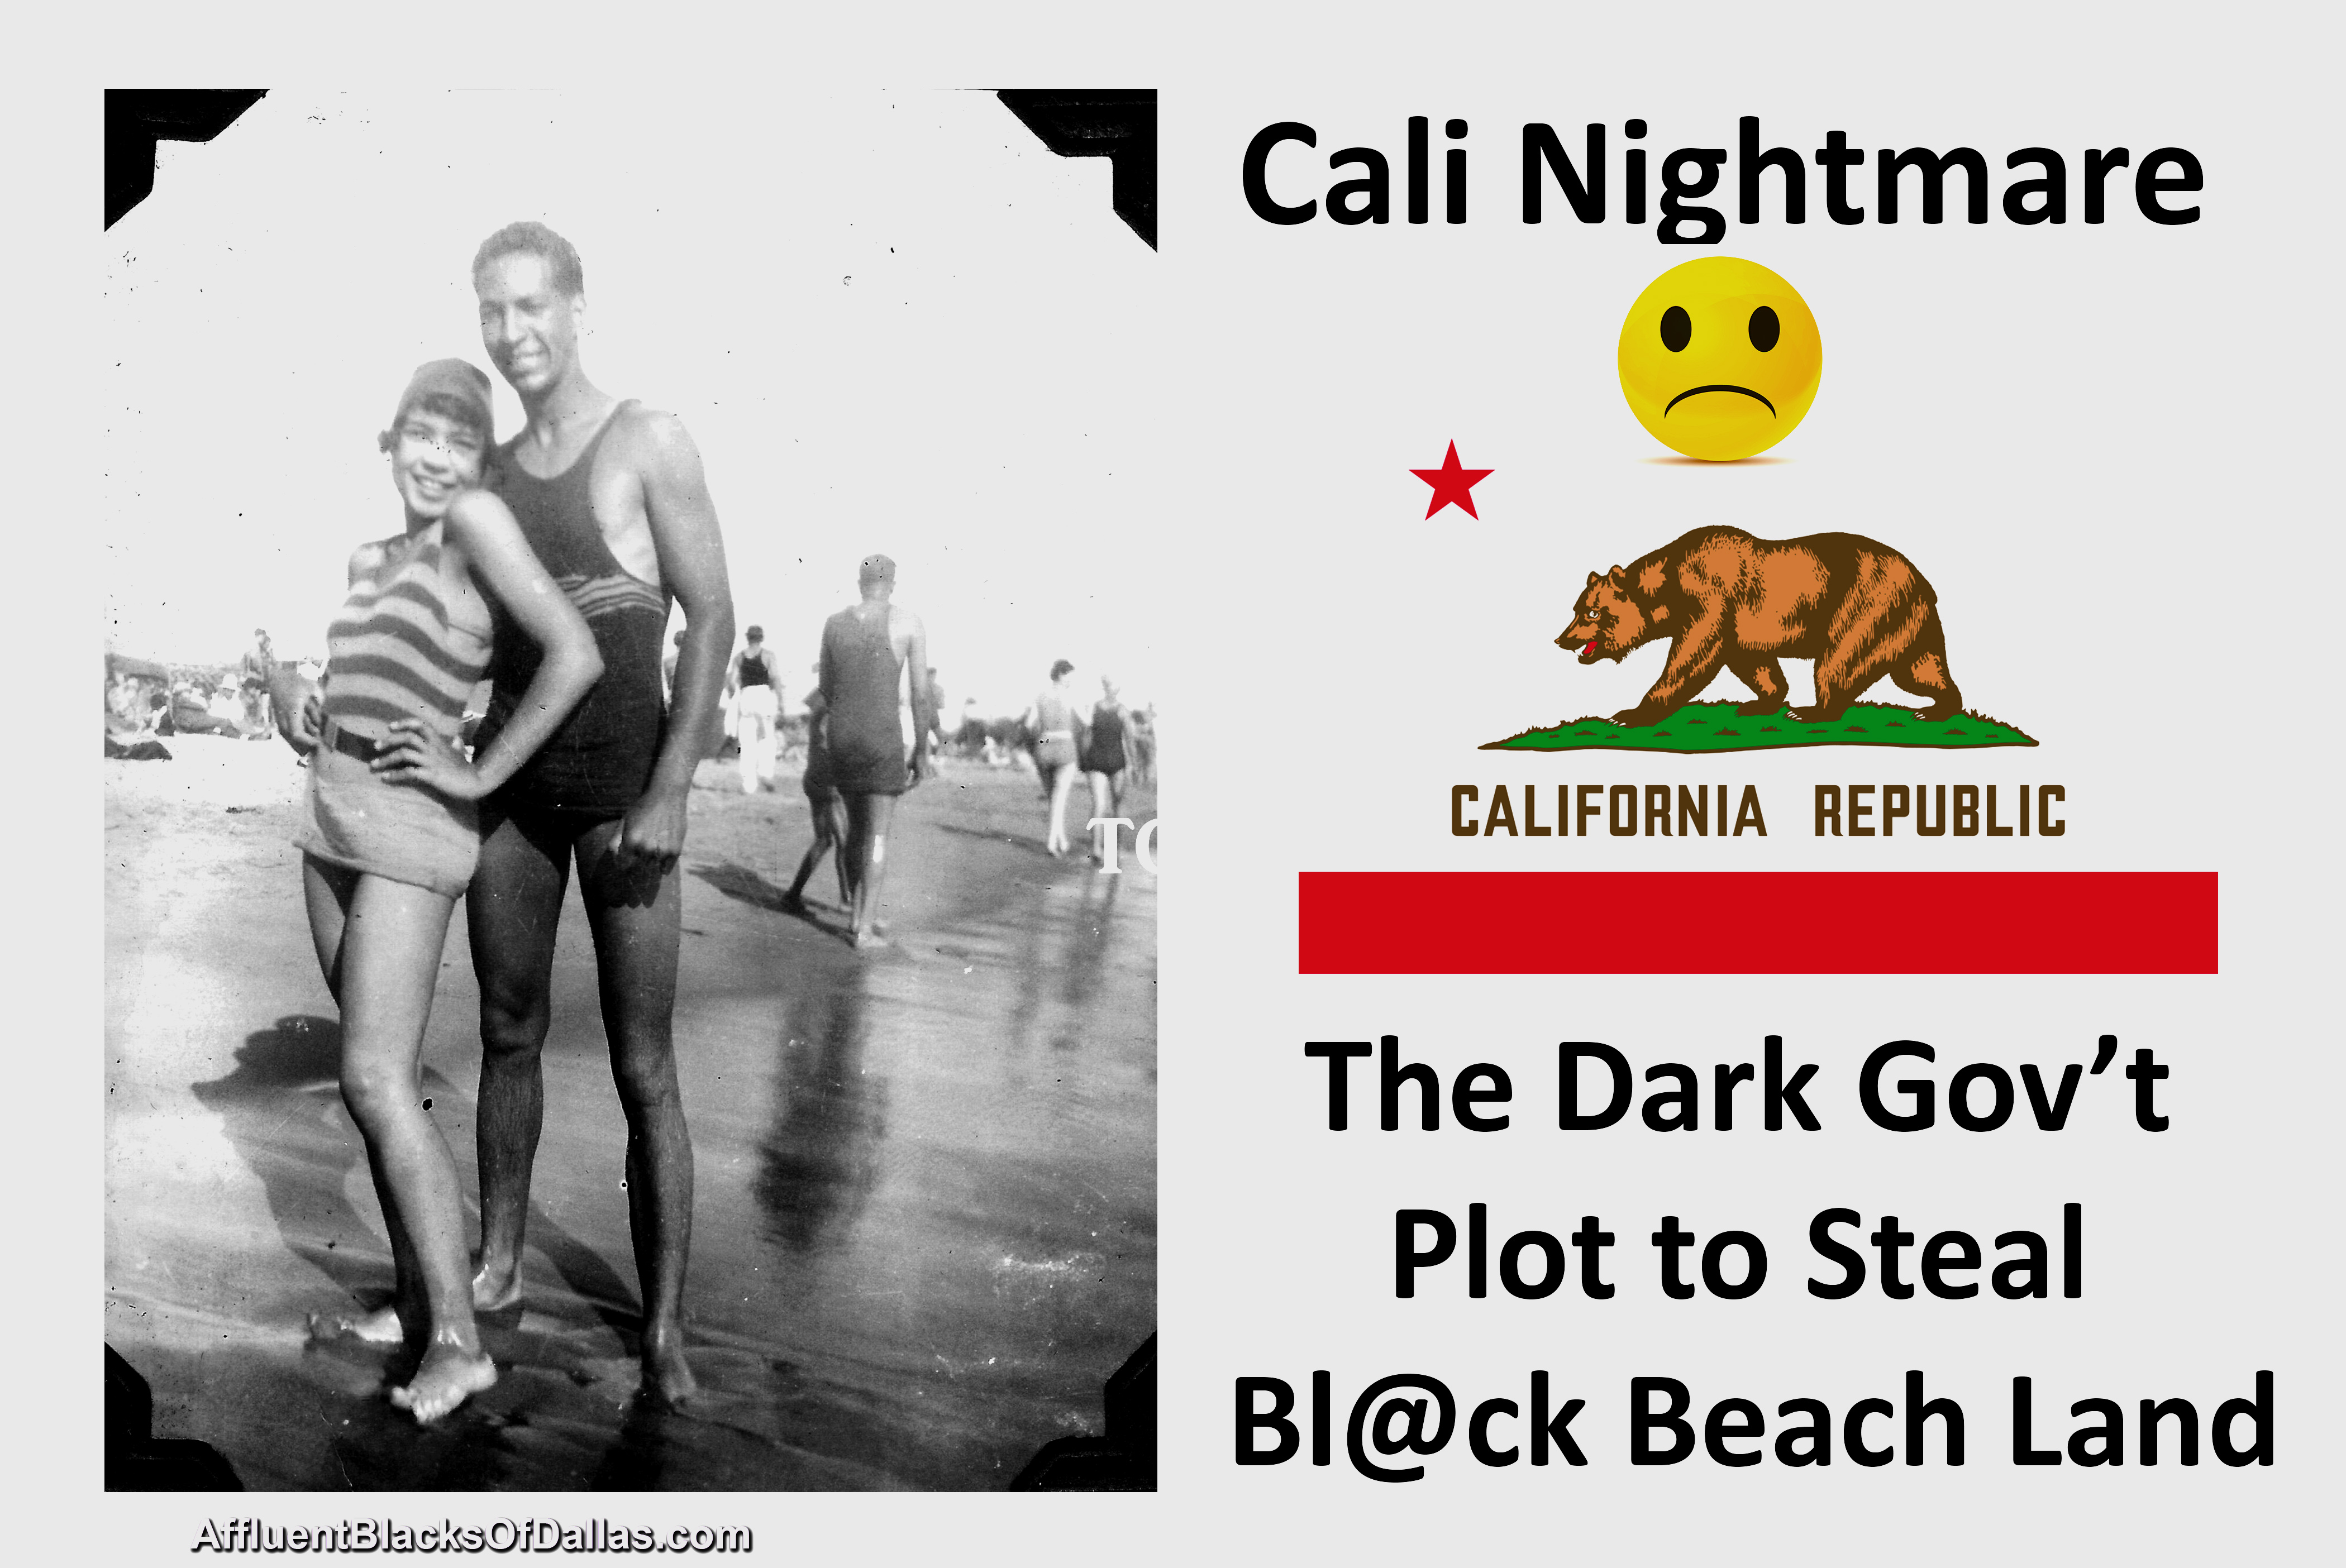 Cali Nightmare: The Dark Gov't Plot to Steal Bl@ck Beach Land